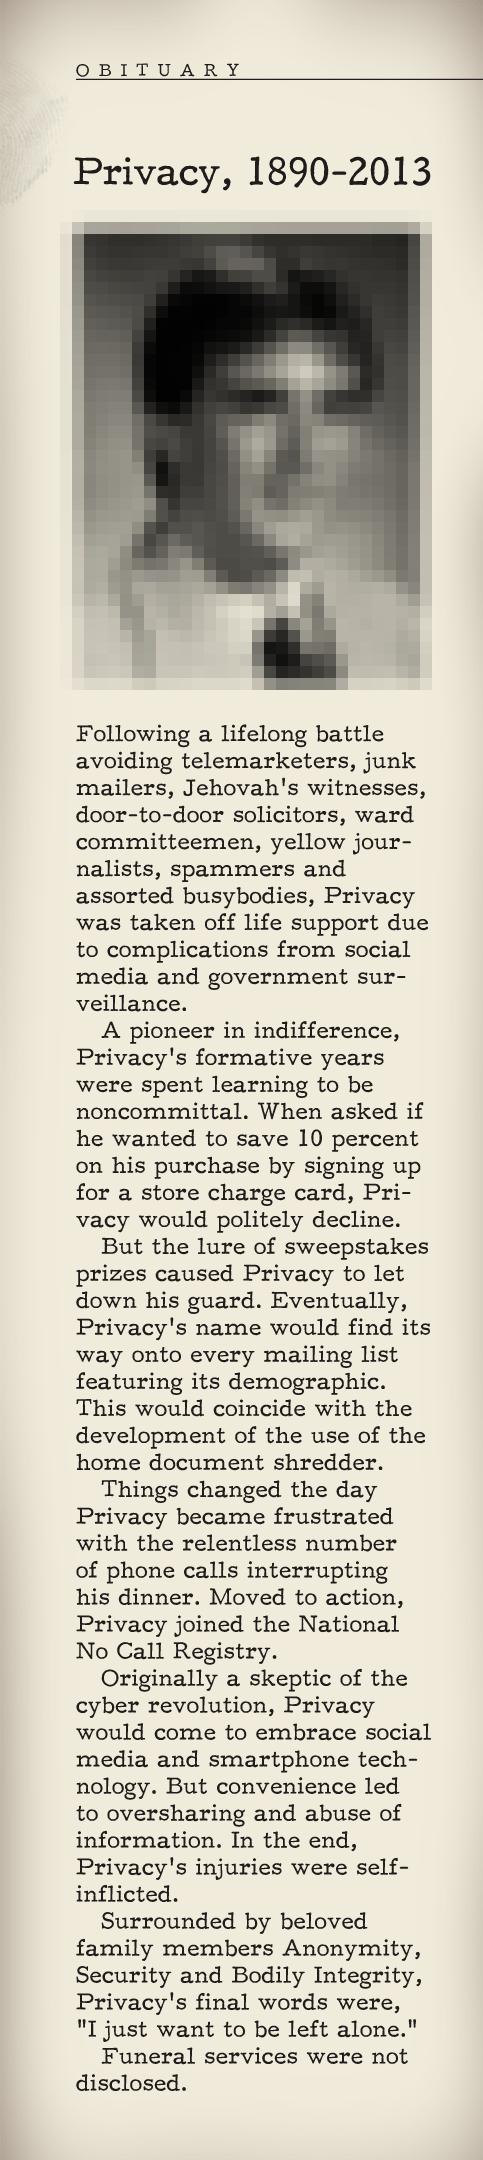 privacy-obit